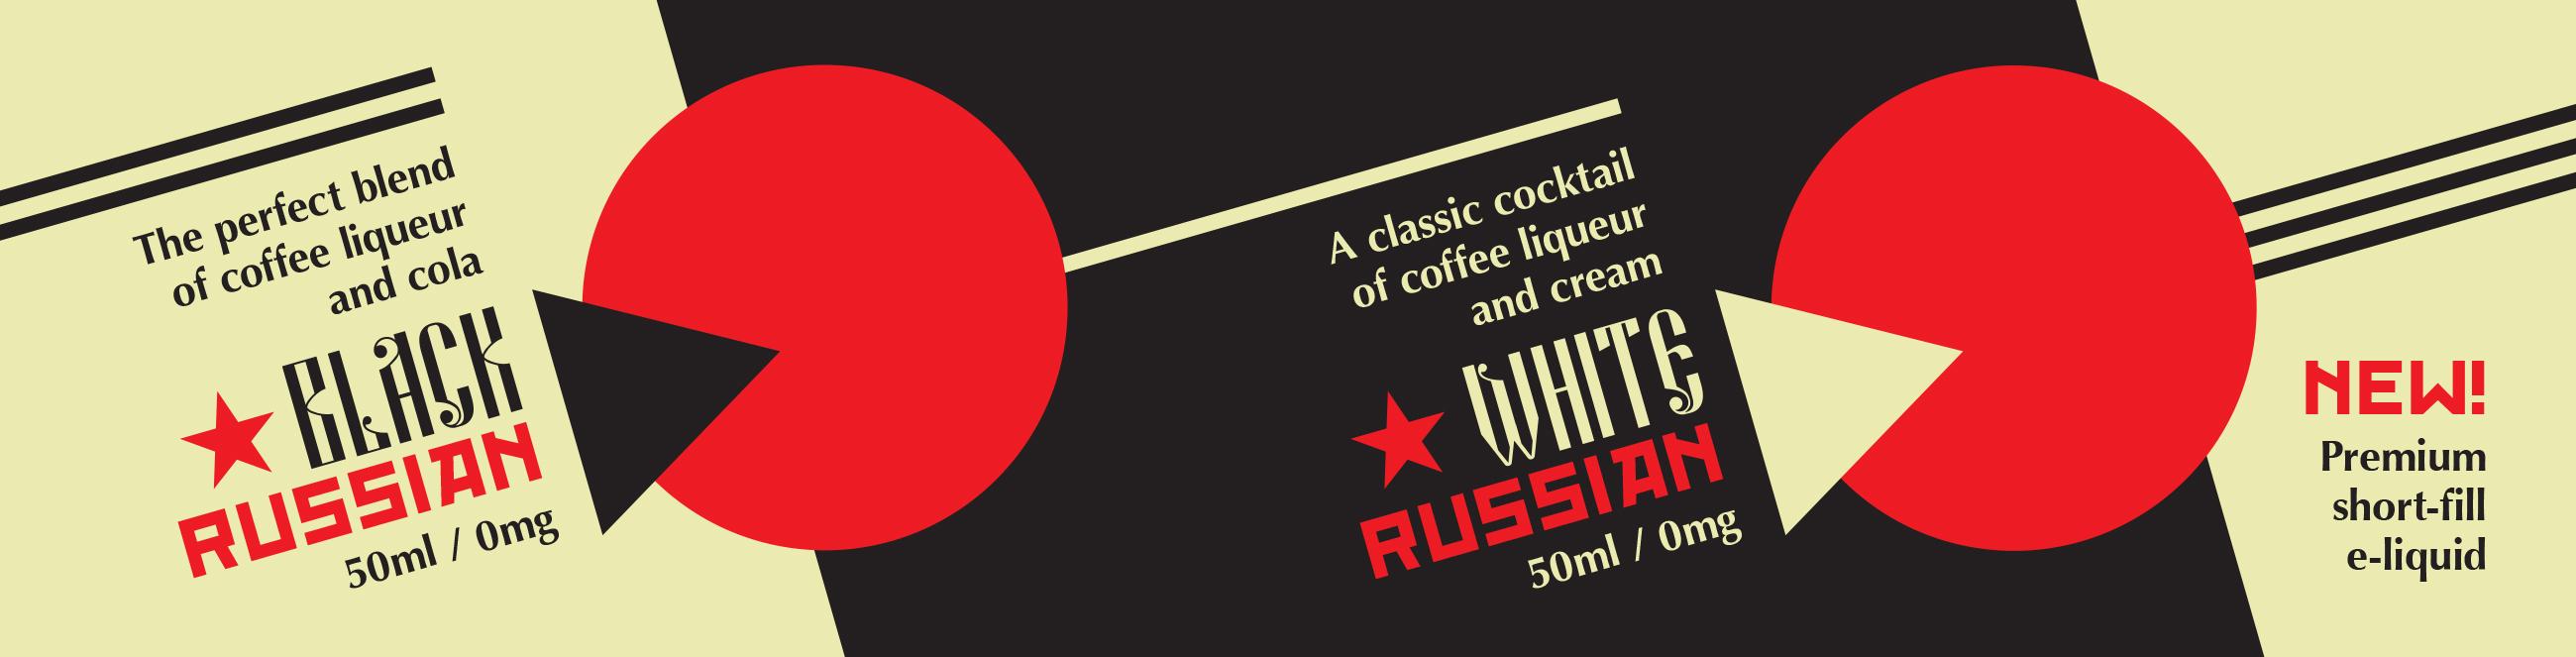 web-banner-russian-1.jpg